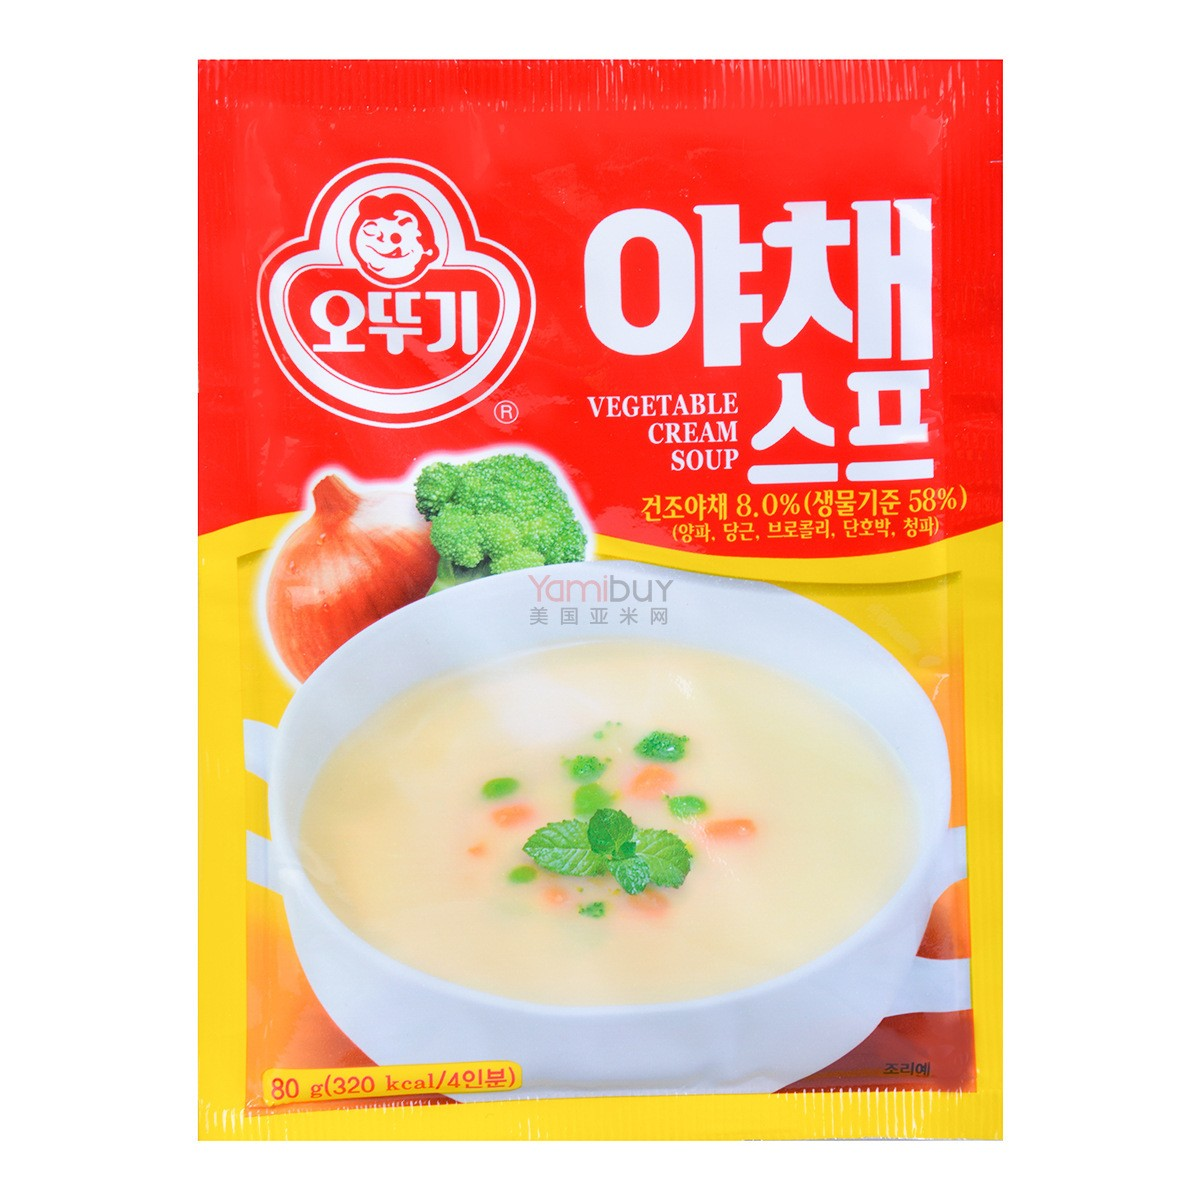 OTTOGI Vegetable Cream Soup 80g